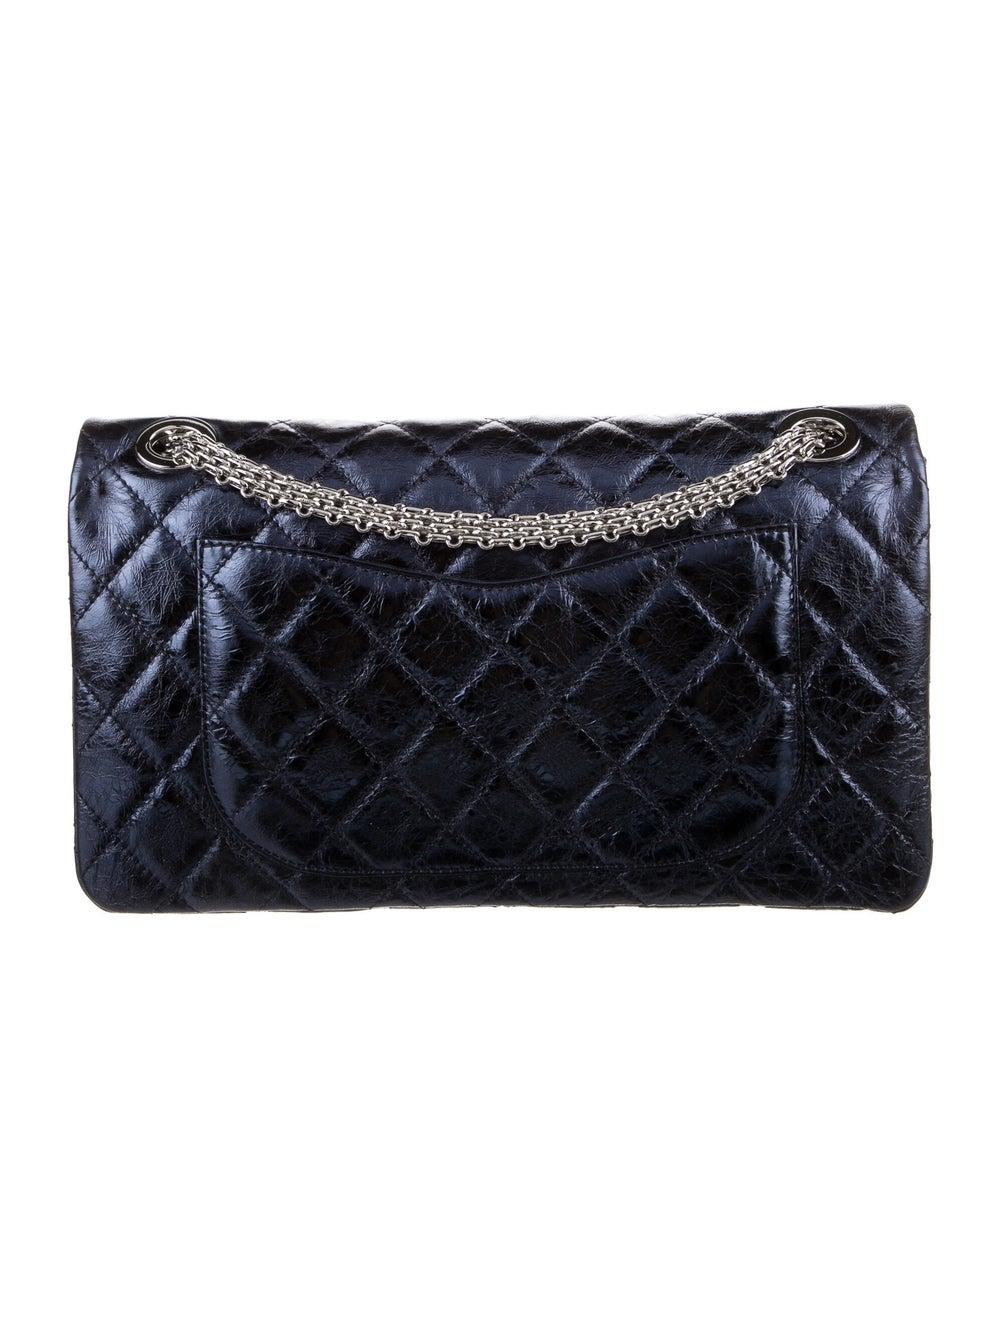 Chanel Reissue 228 Double Flap Bag Blue - image 4